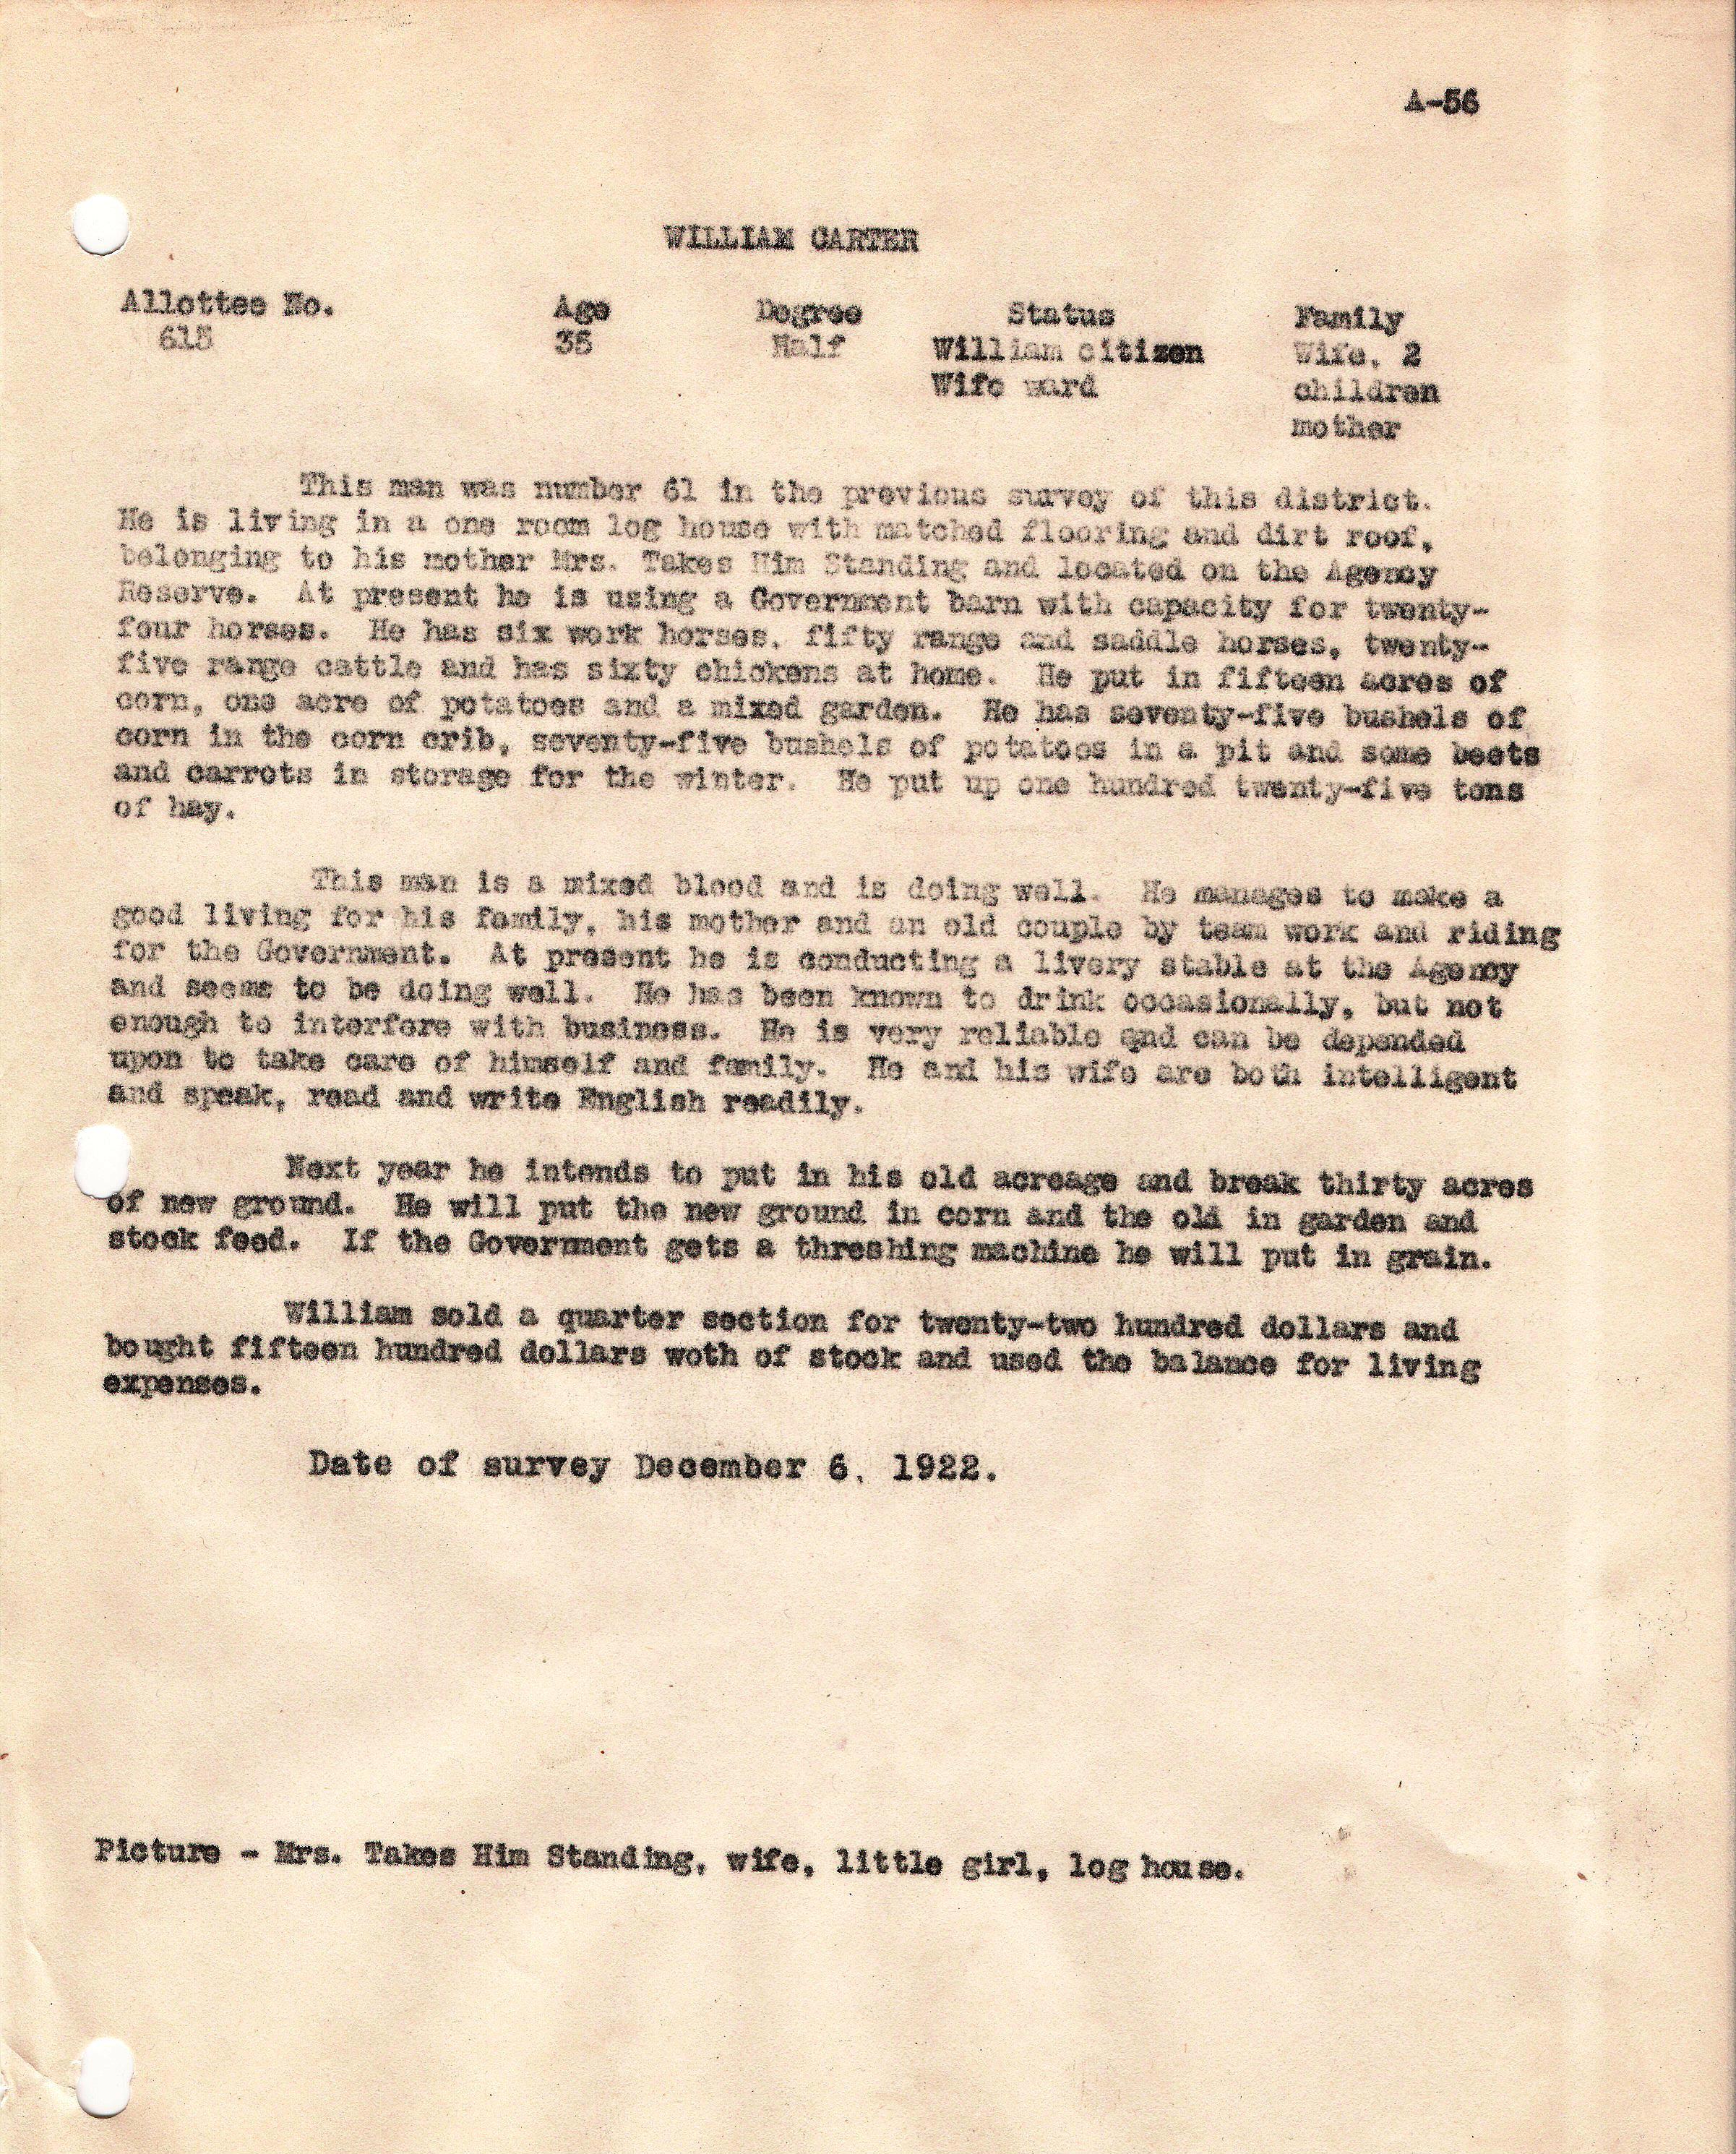 William Carter narrative survey 1922